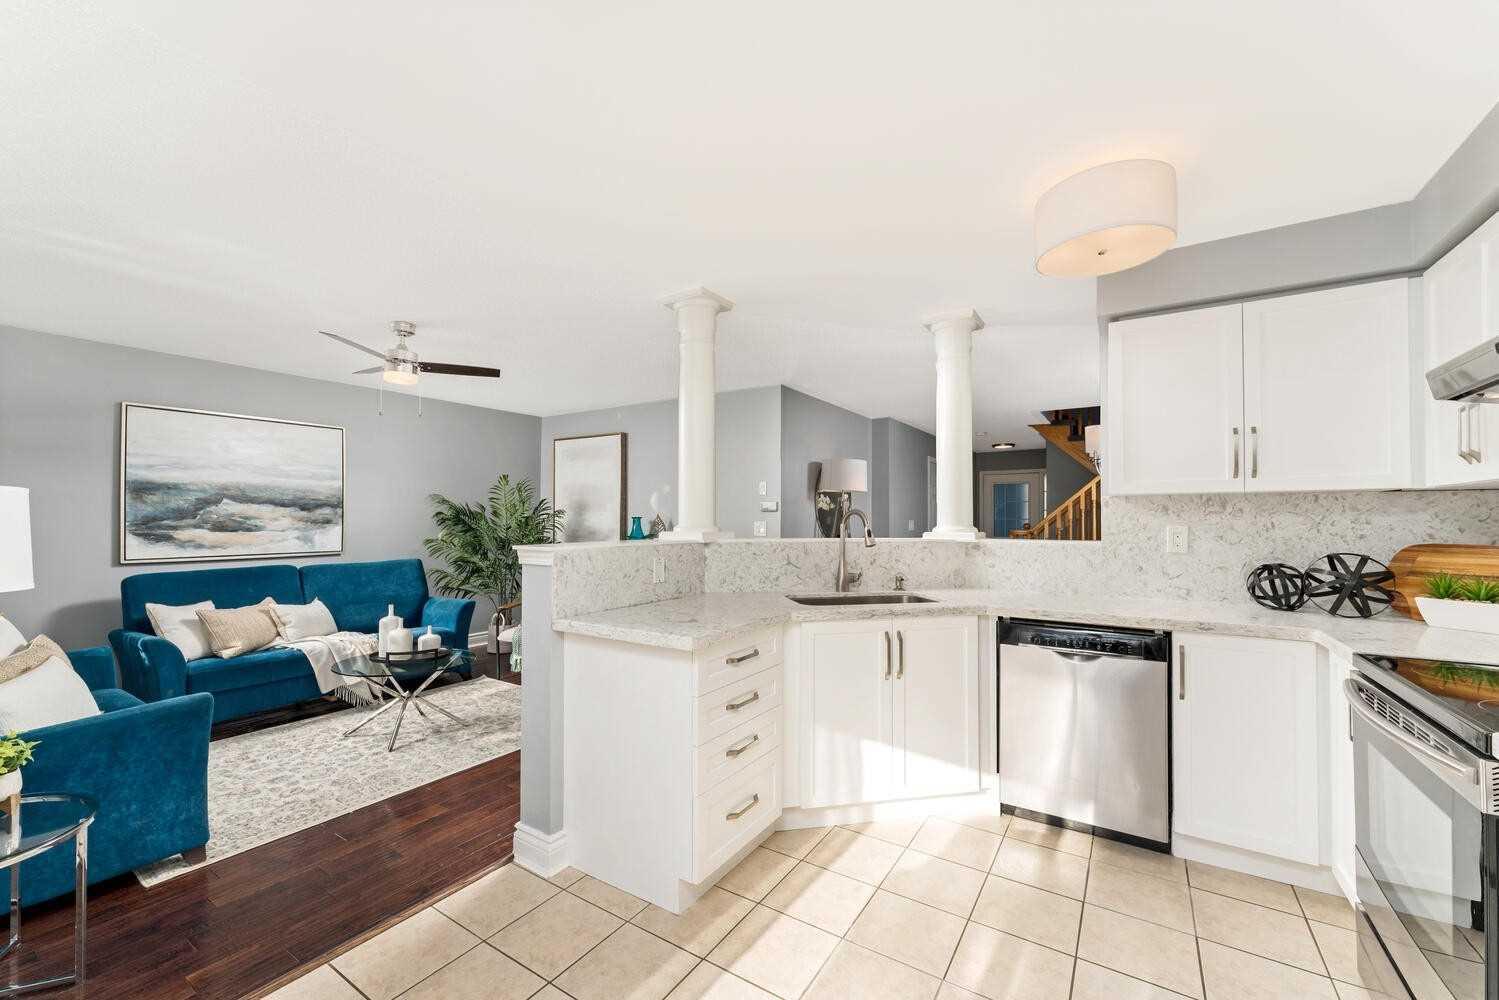 1030 Barclay Circ - Beaty Att/Row/Twnhouse for sale, 3 Bedrooms (W5400435) - #10